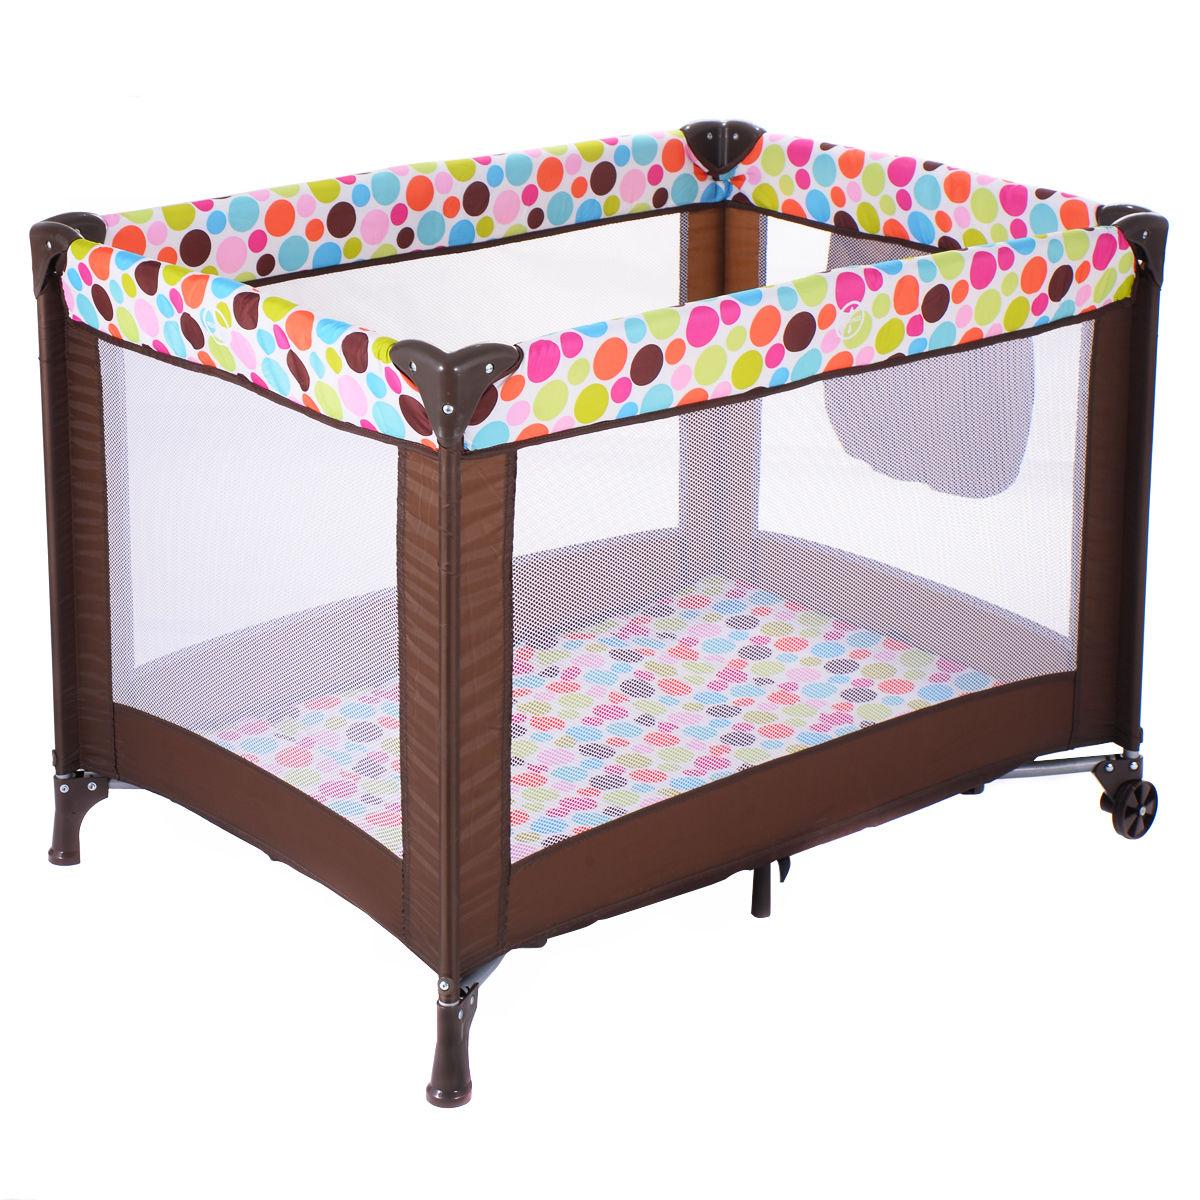 Baby Bassinet Travel Portable Bed Playpen